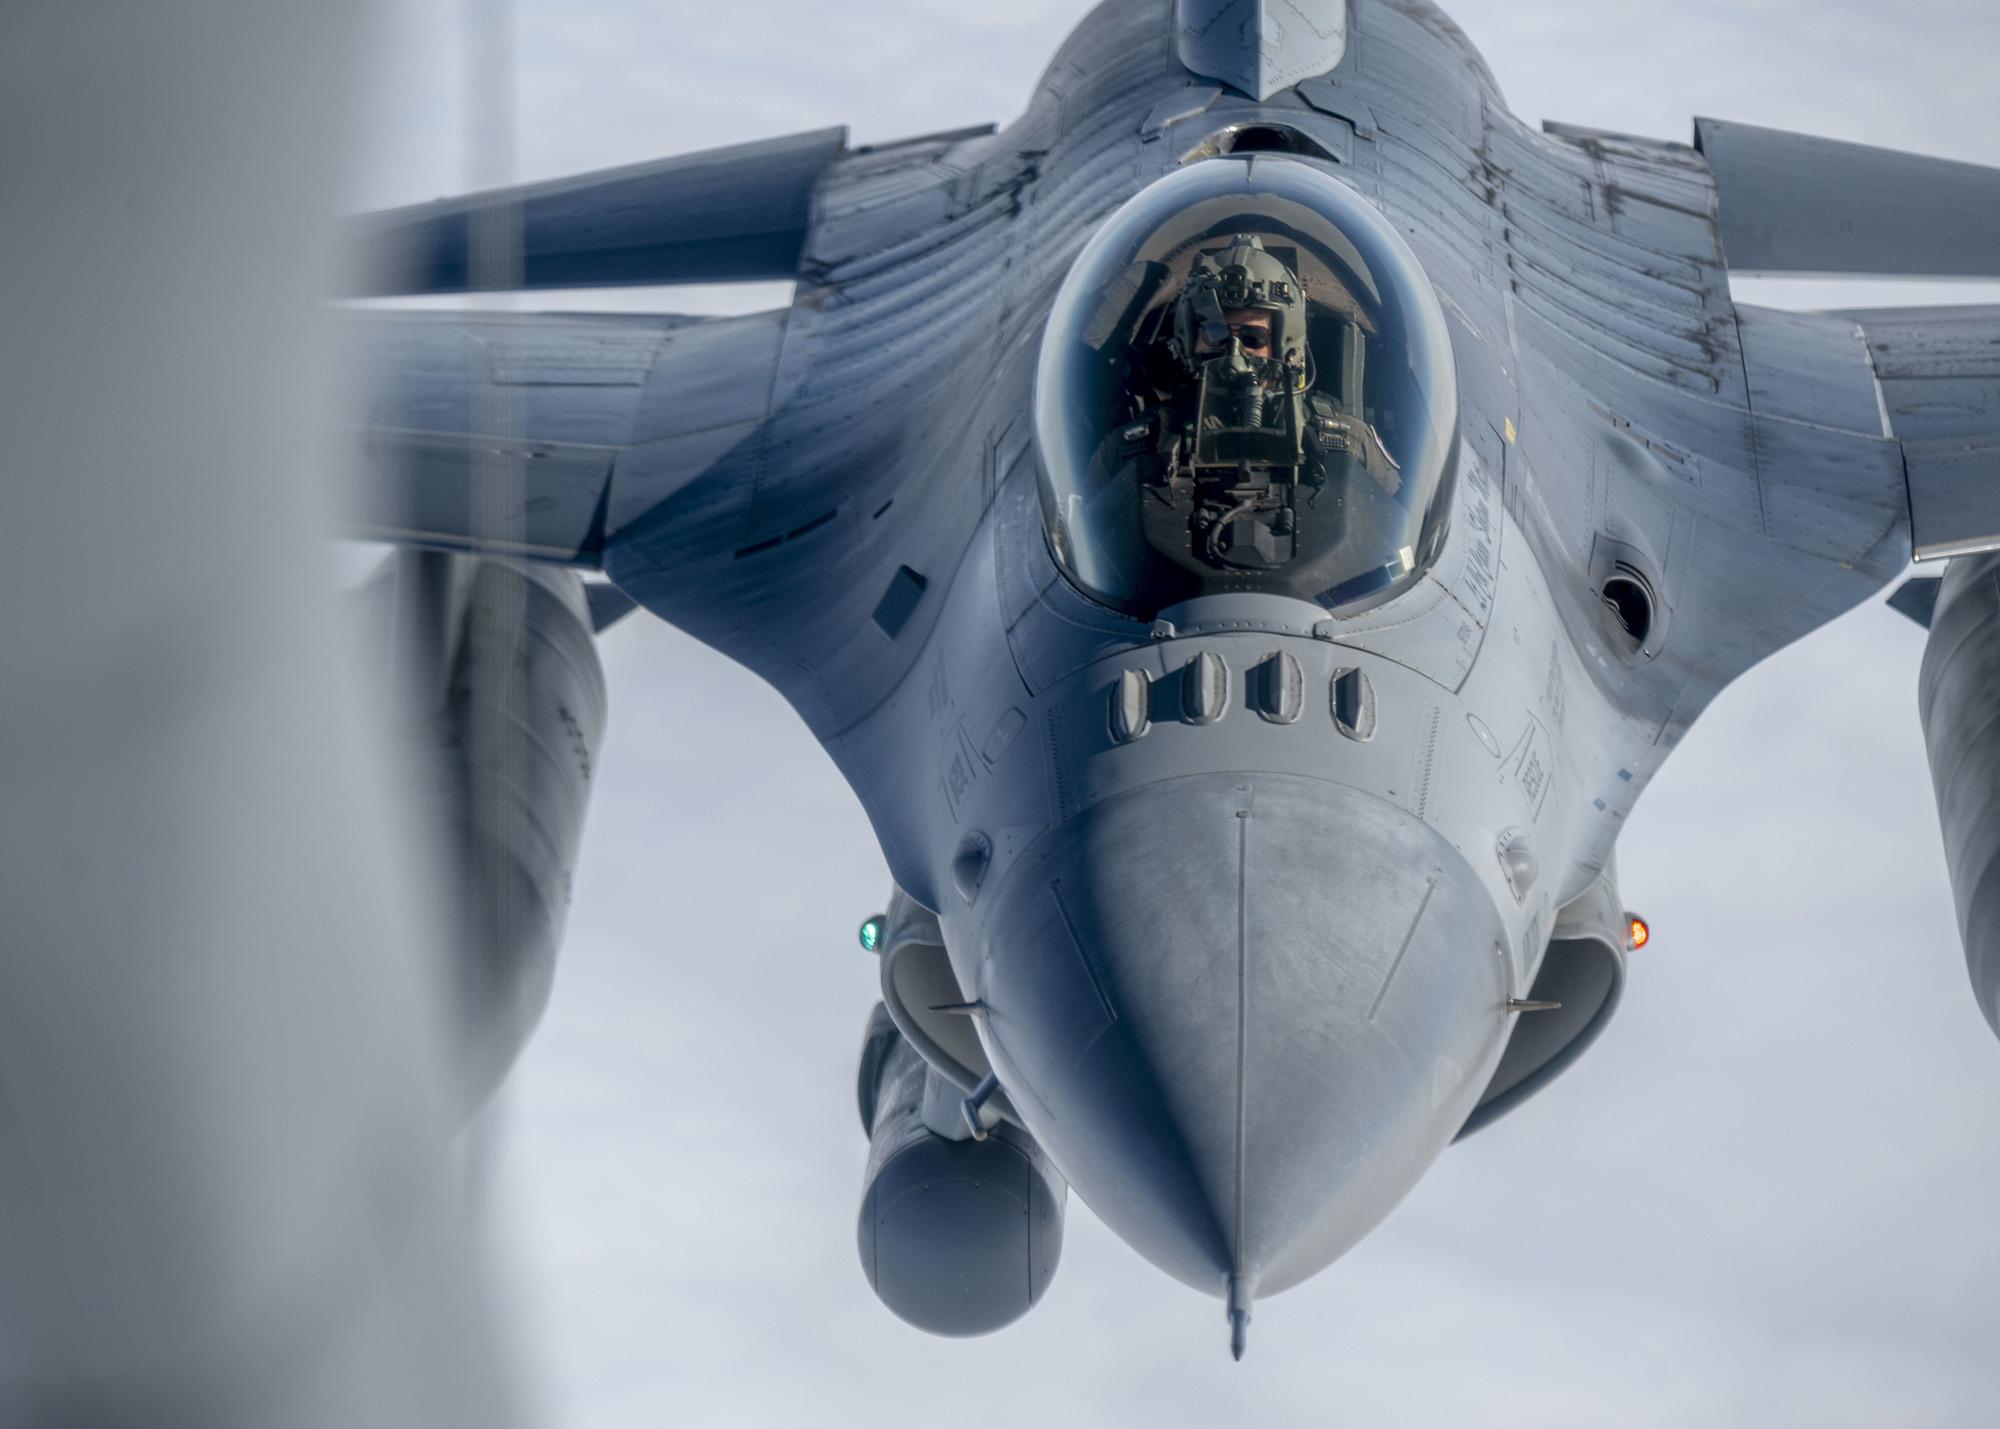 Capt. Joseph Christensen, 120th Fighter Squadron pilot, refuels while returning from exercise Amalgam Dart 21-01, June 17, 2021. (Airman Mira Roman/Air National Guard)